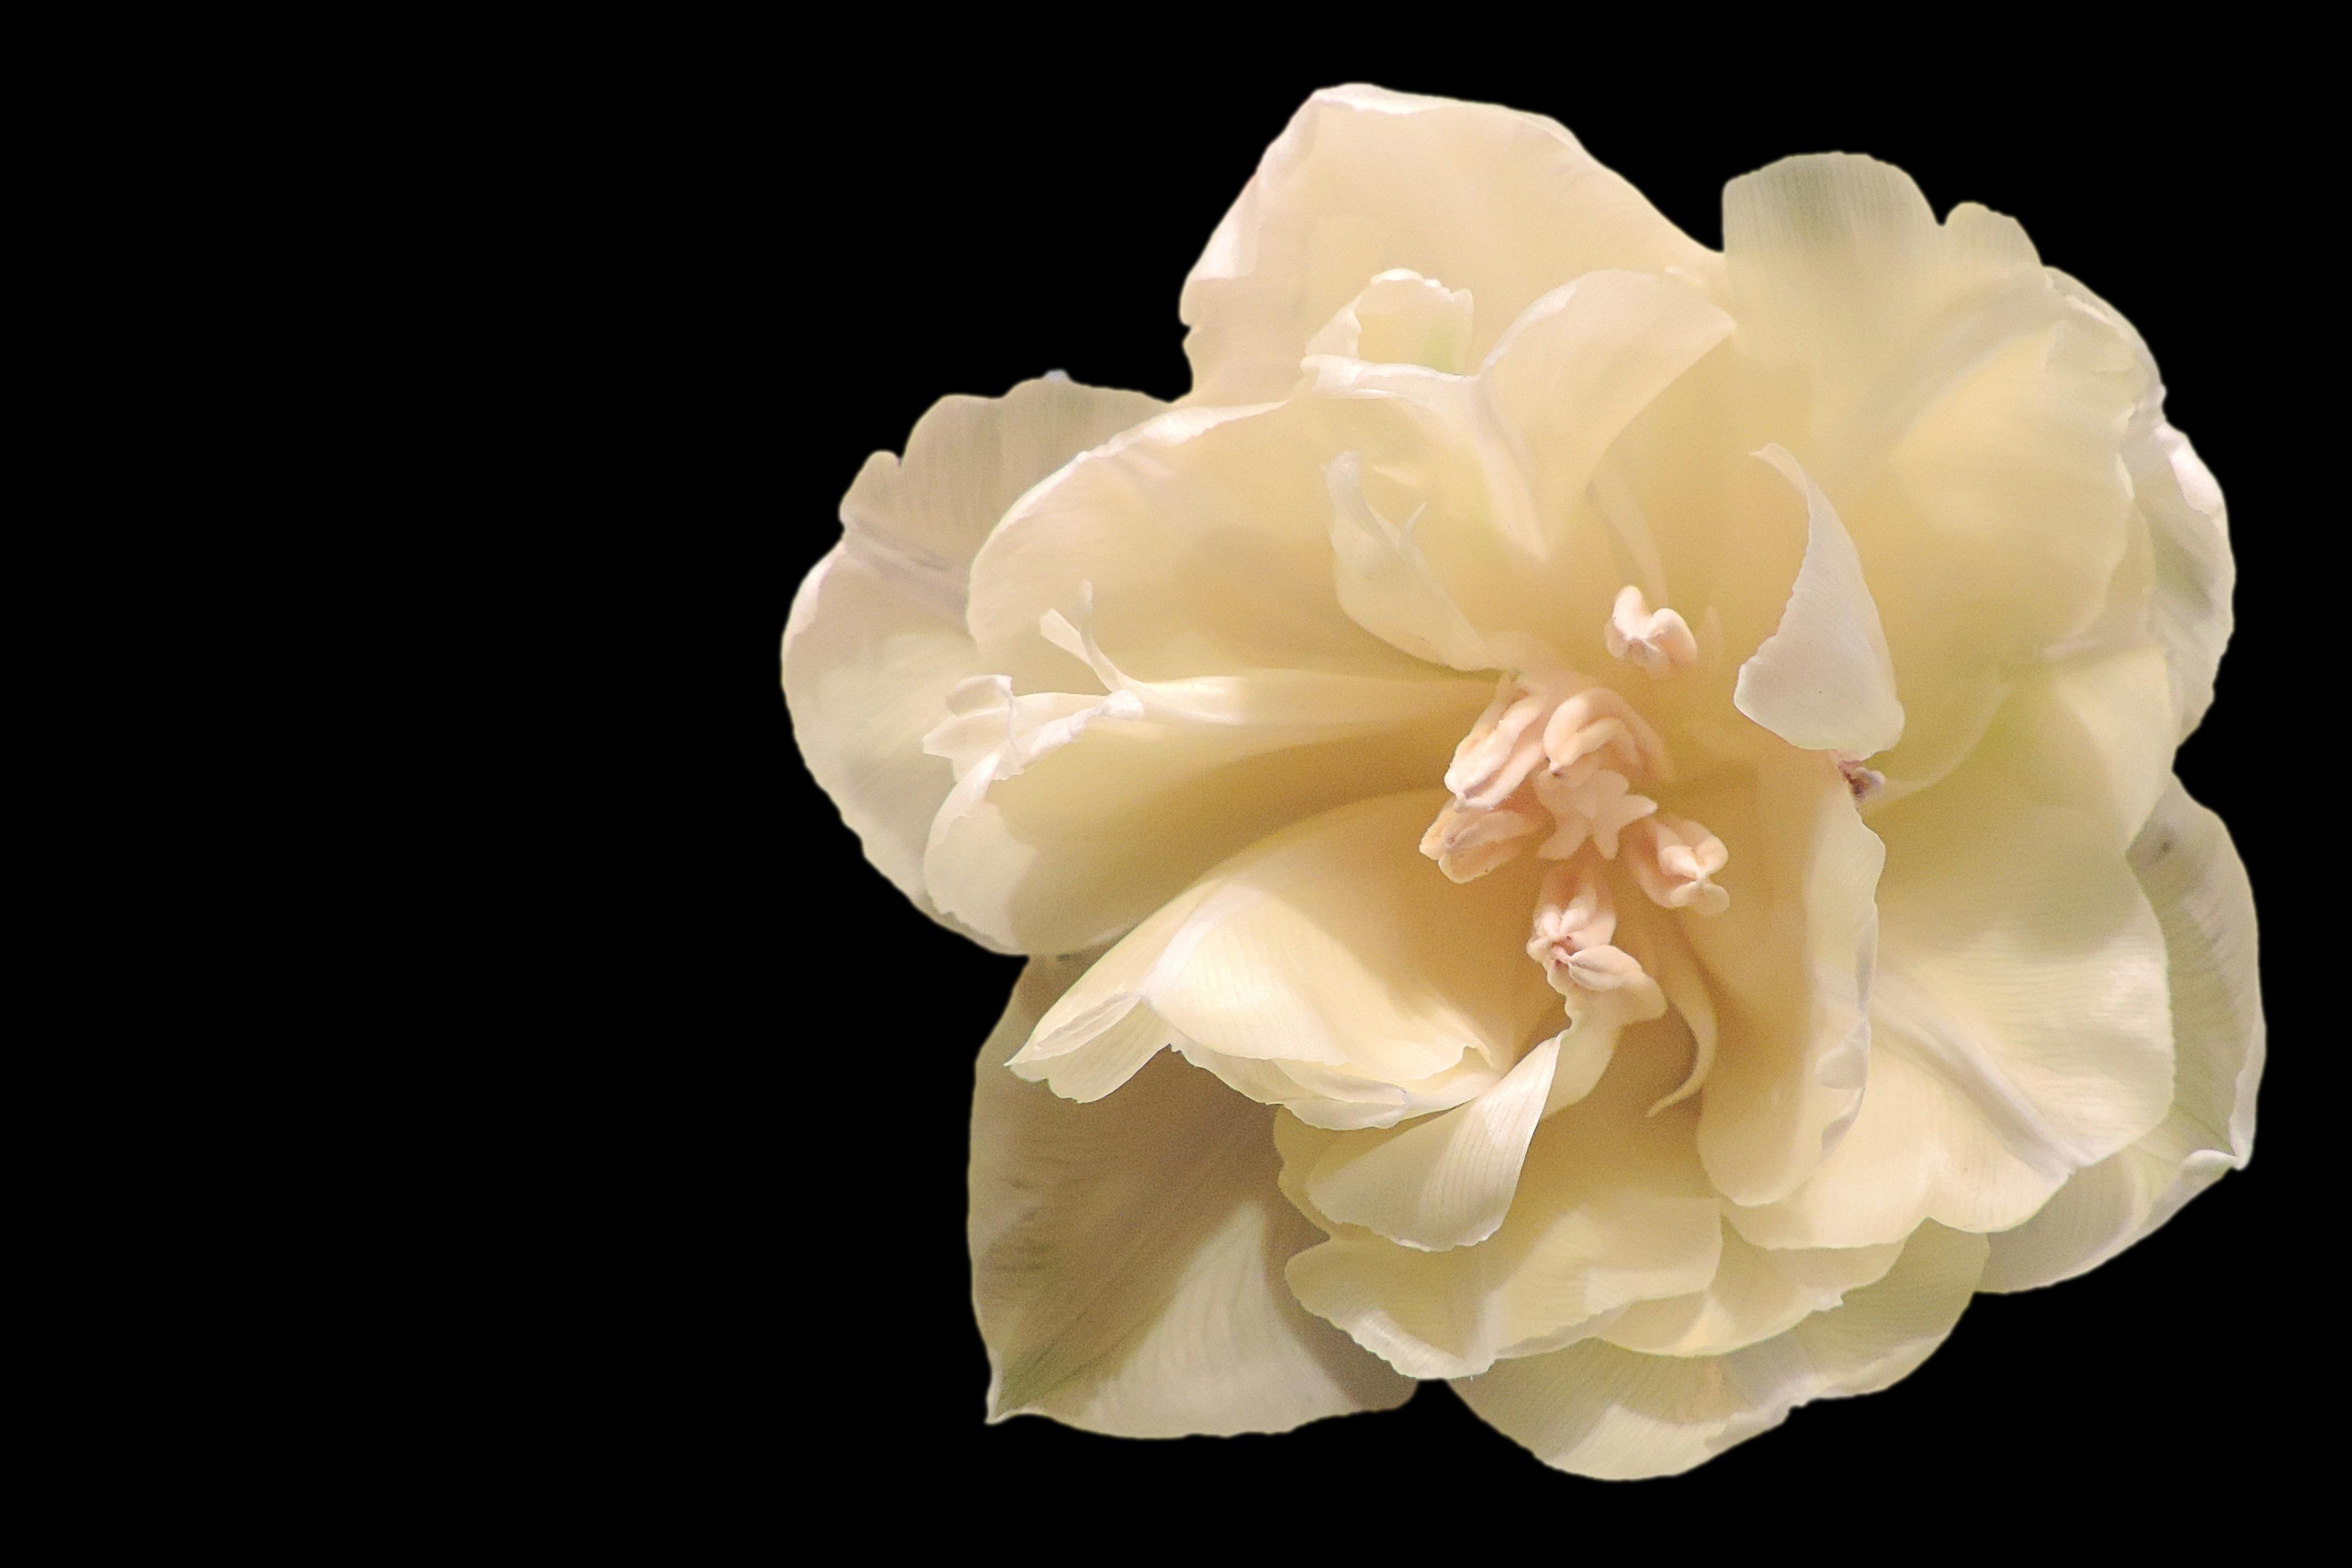 Free images blossom white flower petal bloom tulip yellow blossom plant white flower petal bloom tulip rose yellow peony gardenia macro photography flowering plant garden mightylinksfo